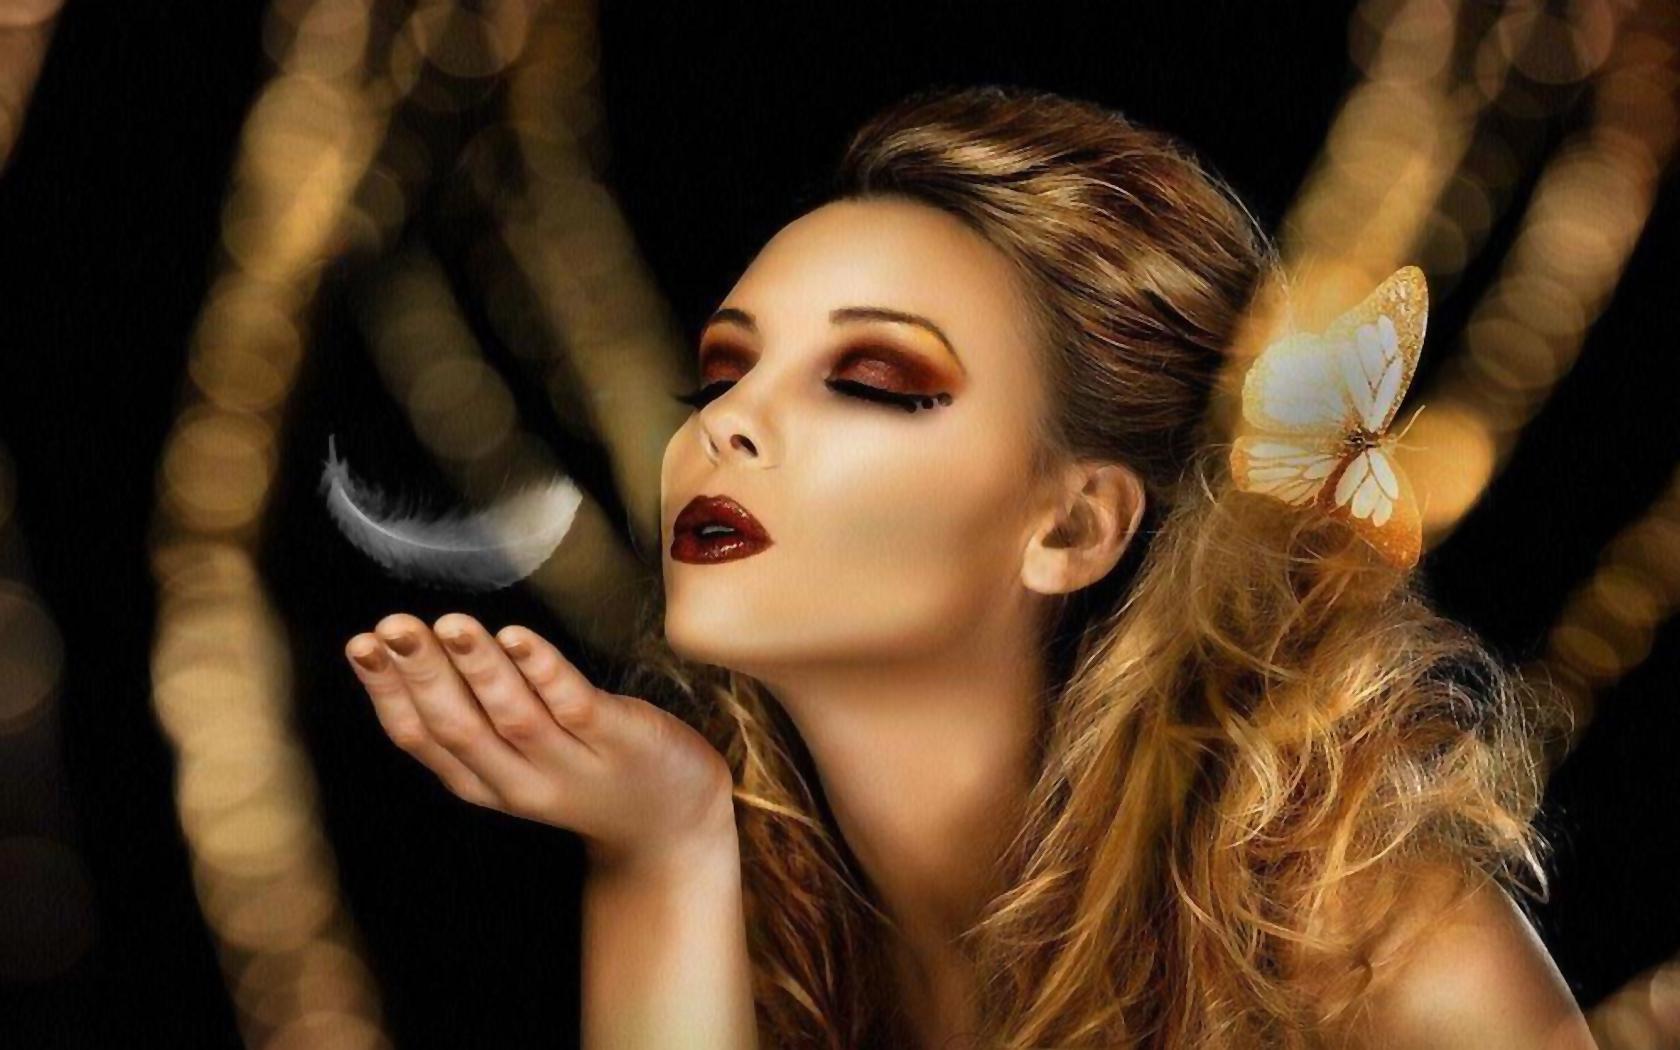 Most Beautiful Woman HD desktop wallpaper High Definition